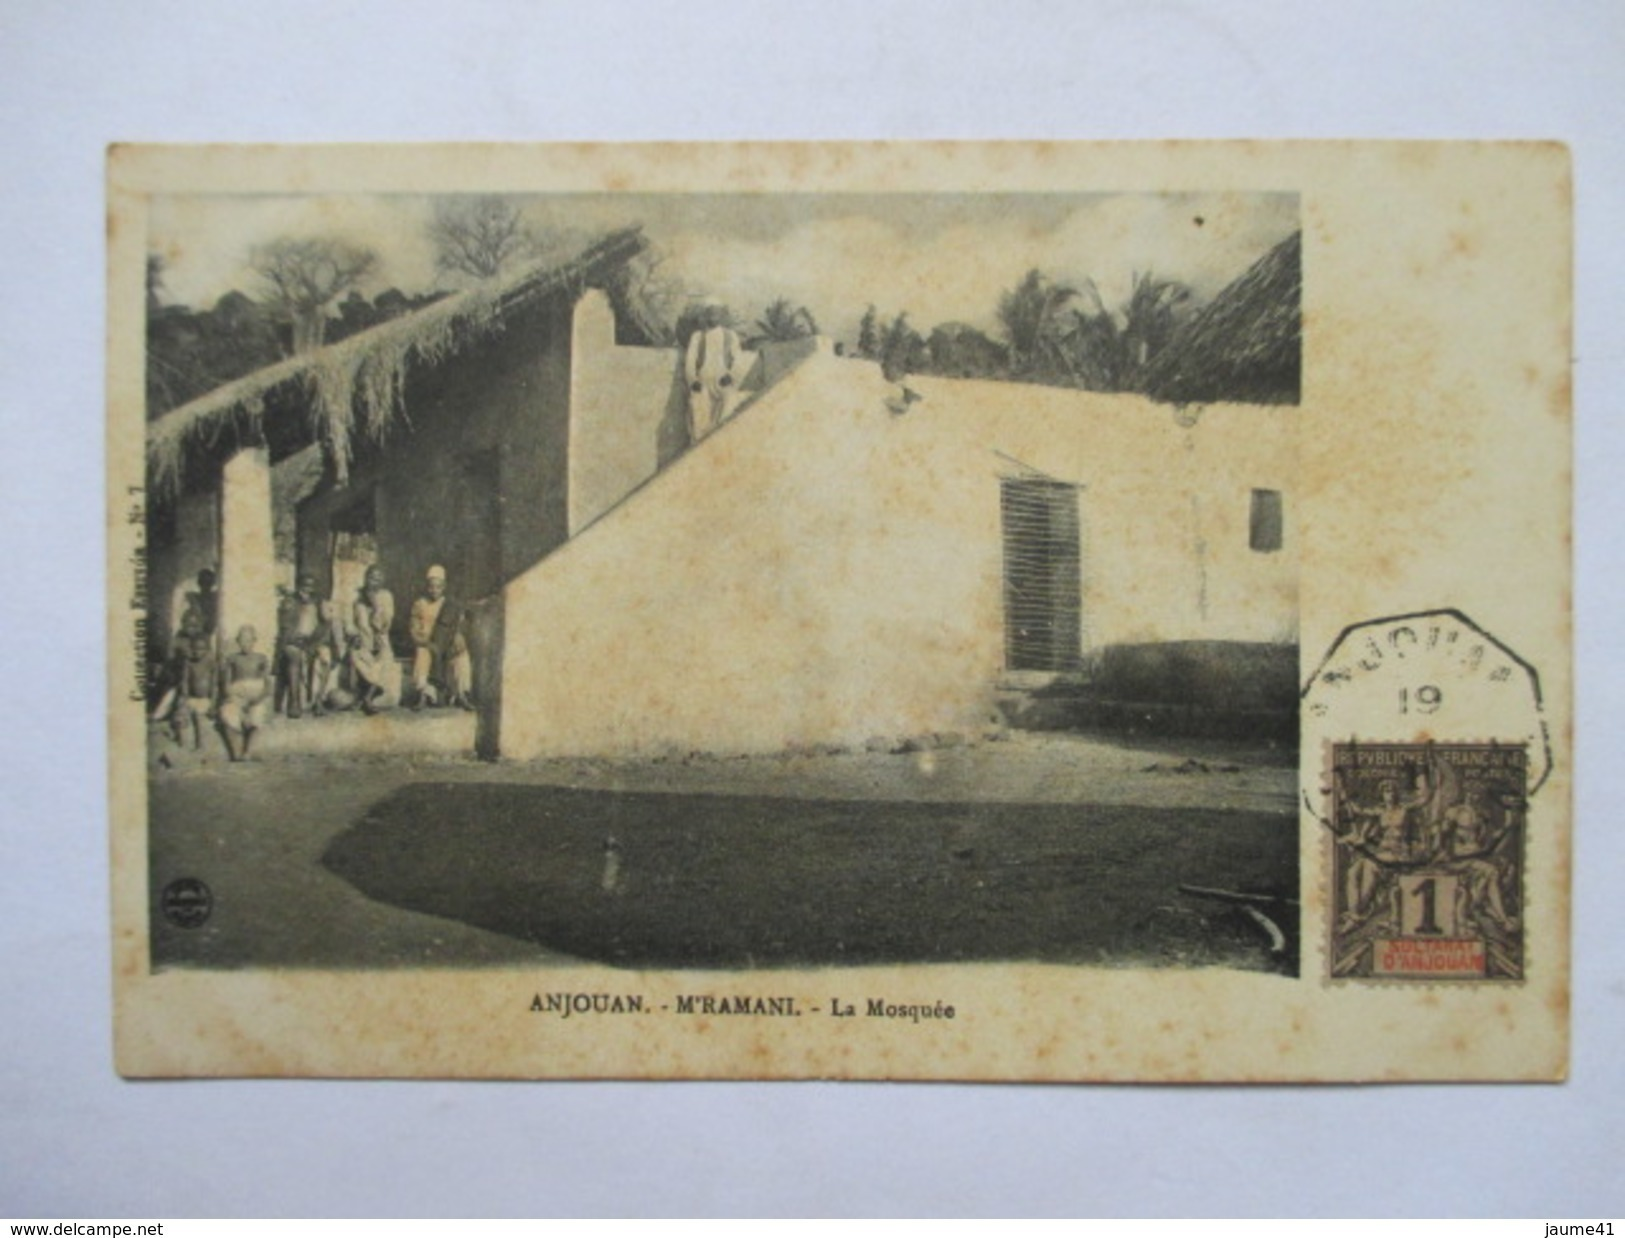 COMORES  -  ANJOUAN  -   M'RAMANI  -  LA MOSQUEE     ANIME    TTB - Comores